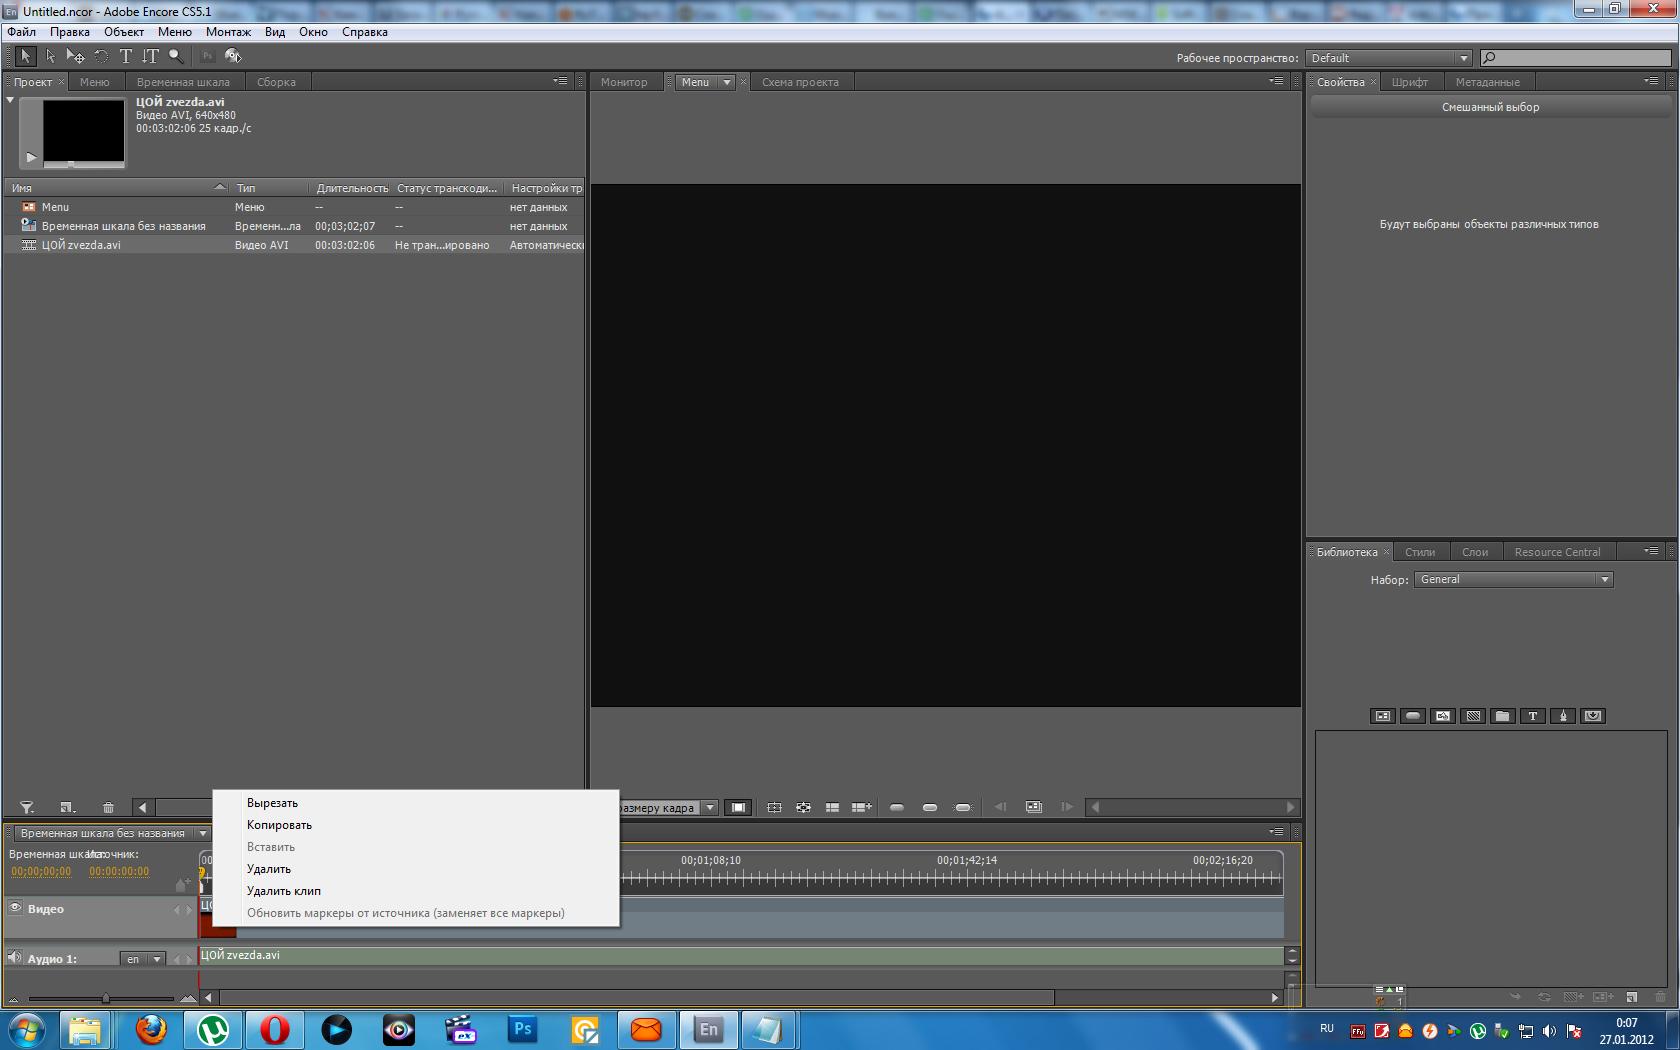 Adobe Premiere Pro CS5.5 Версия программы: 5.5.2 Разработчик: Adobe Я